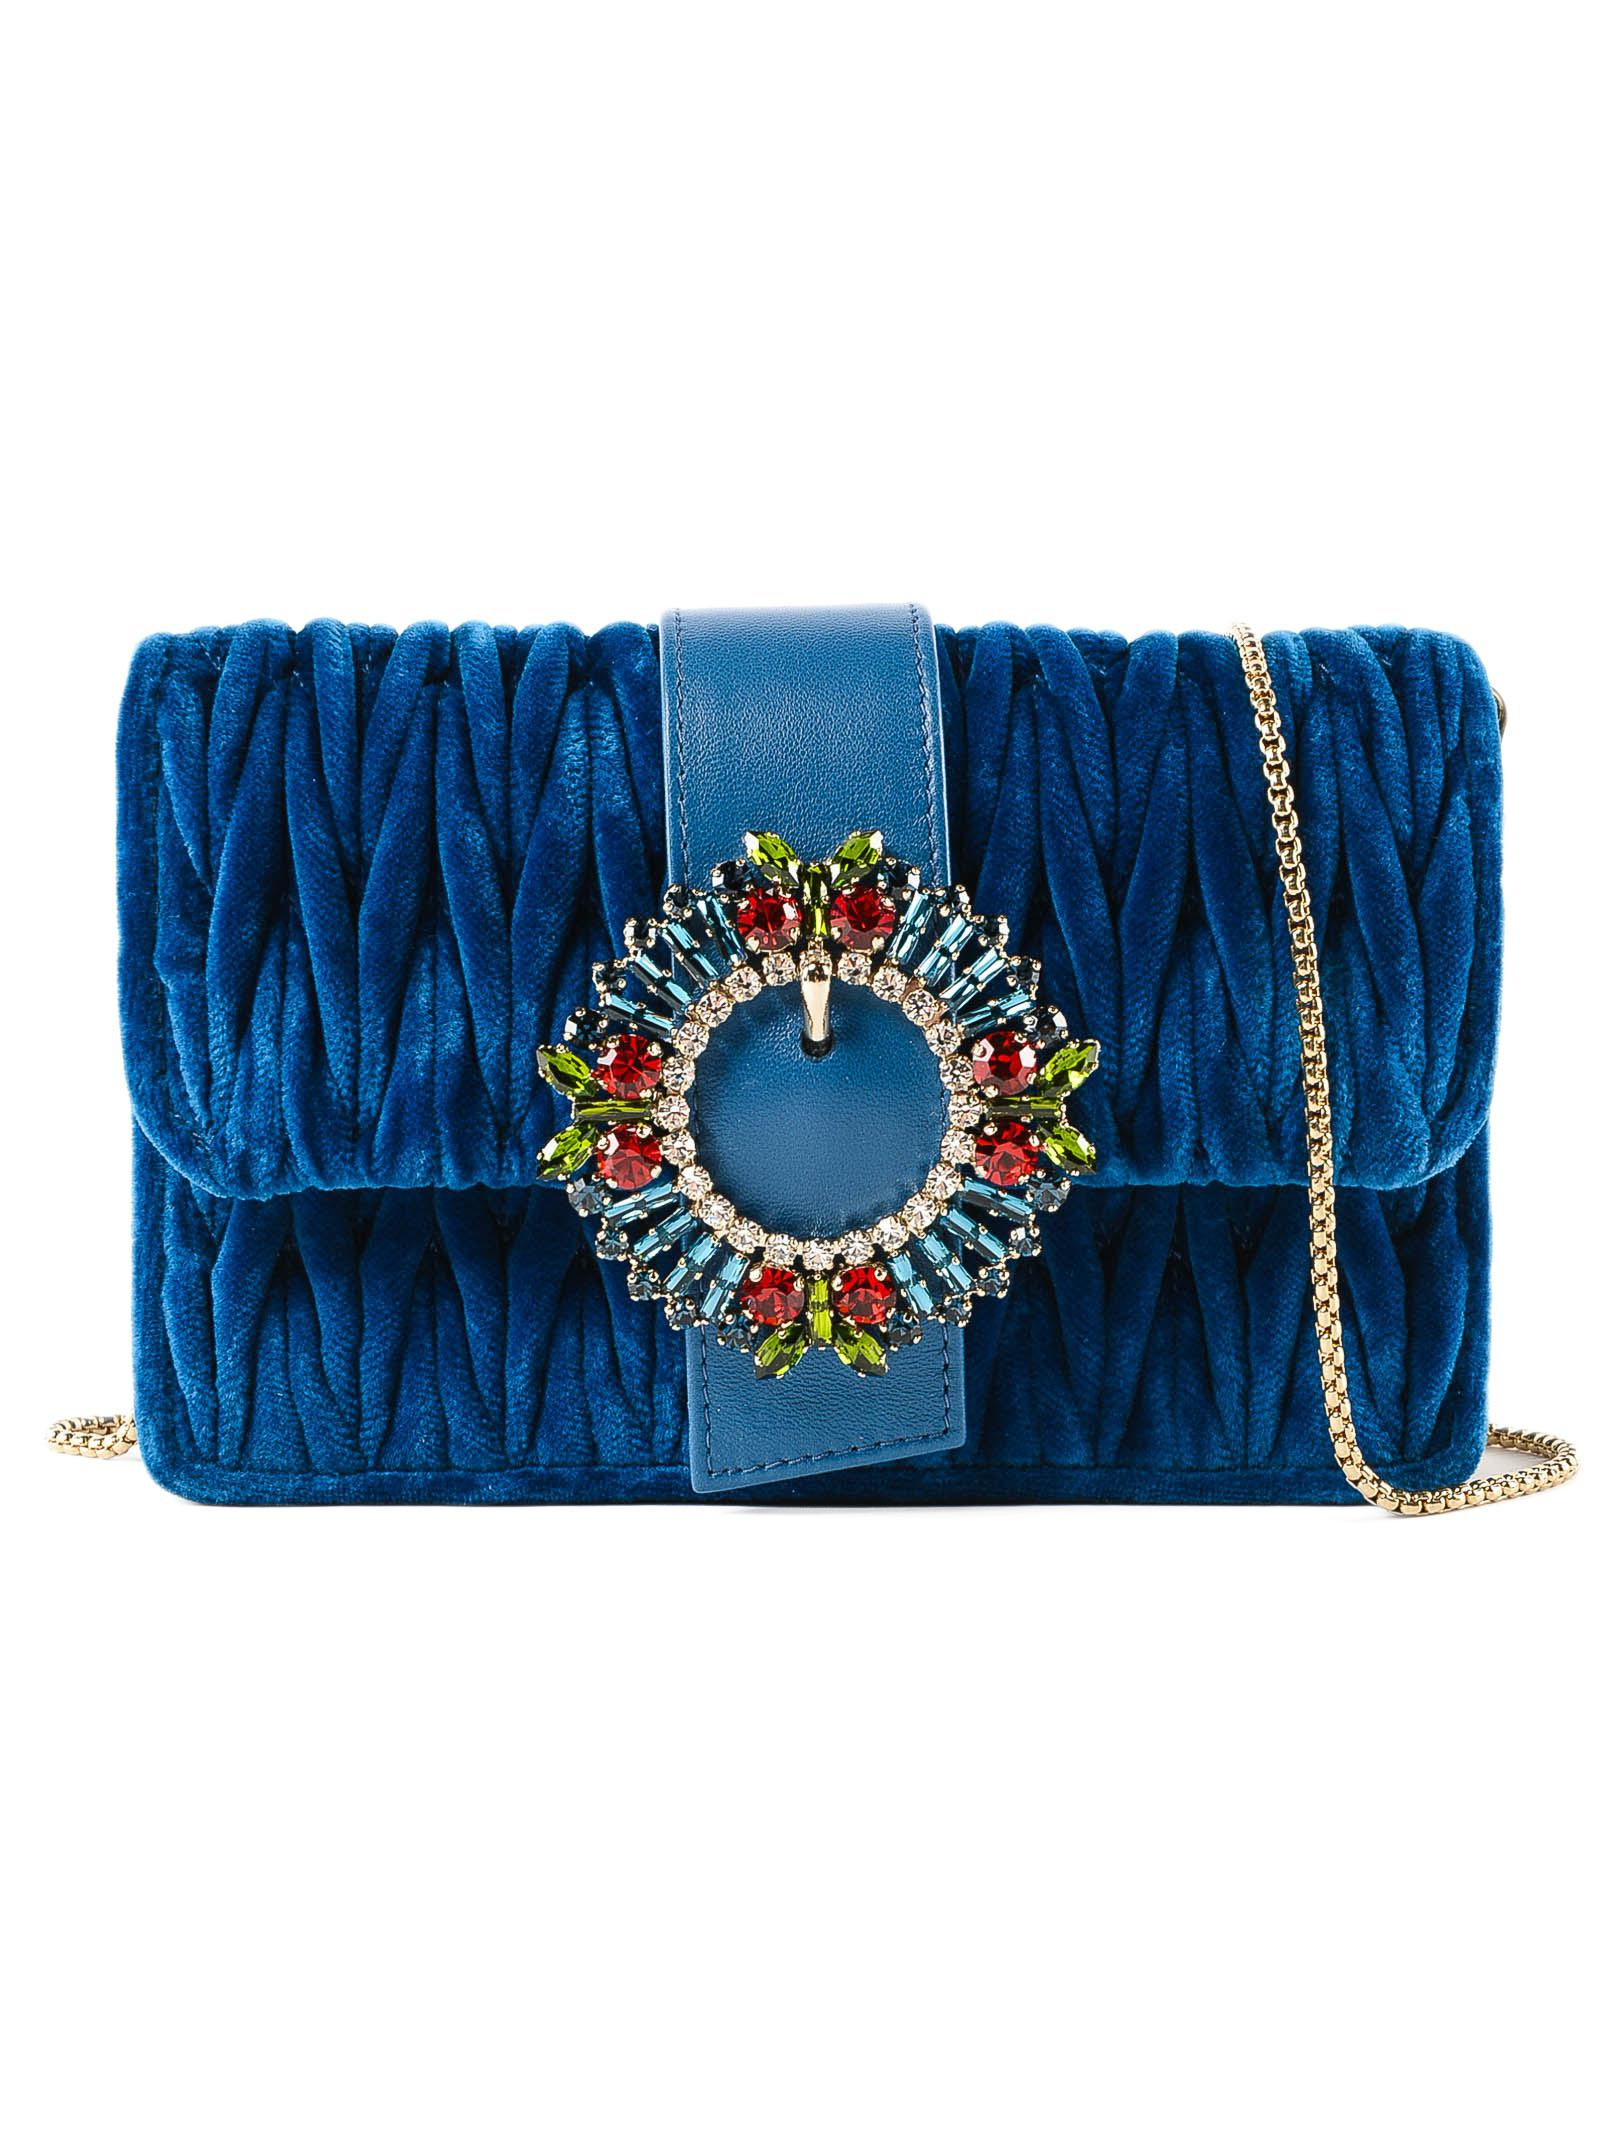 e715d8e287df Lyst - Miu Miu Velvet Crossbody Bag in Blue